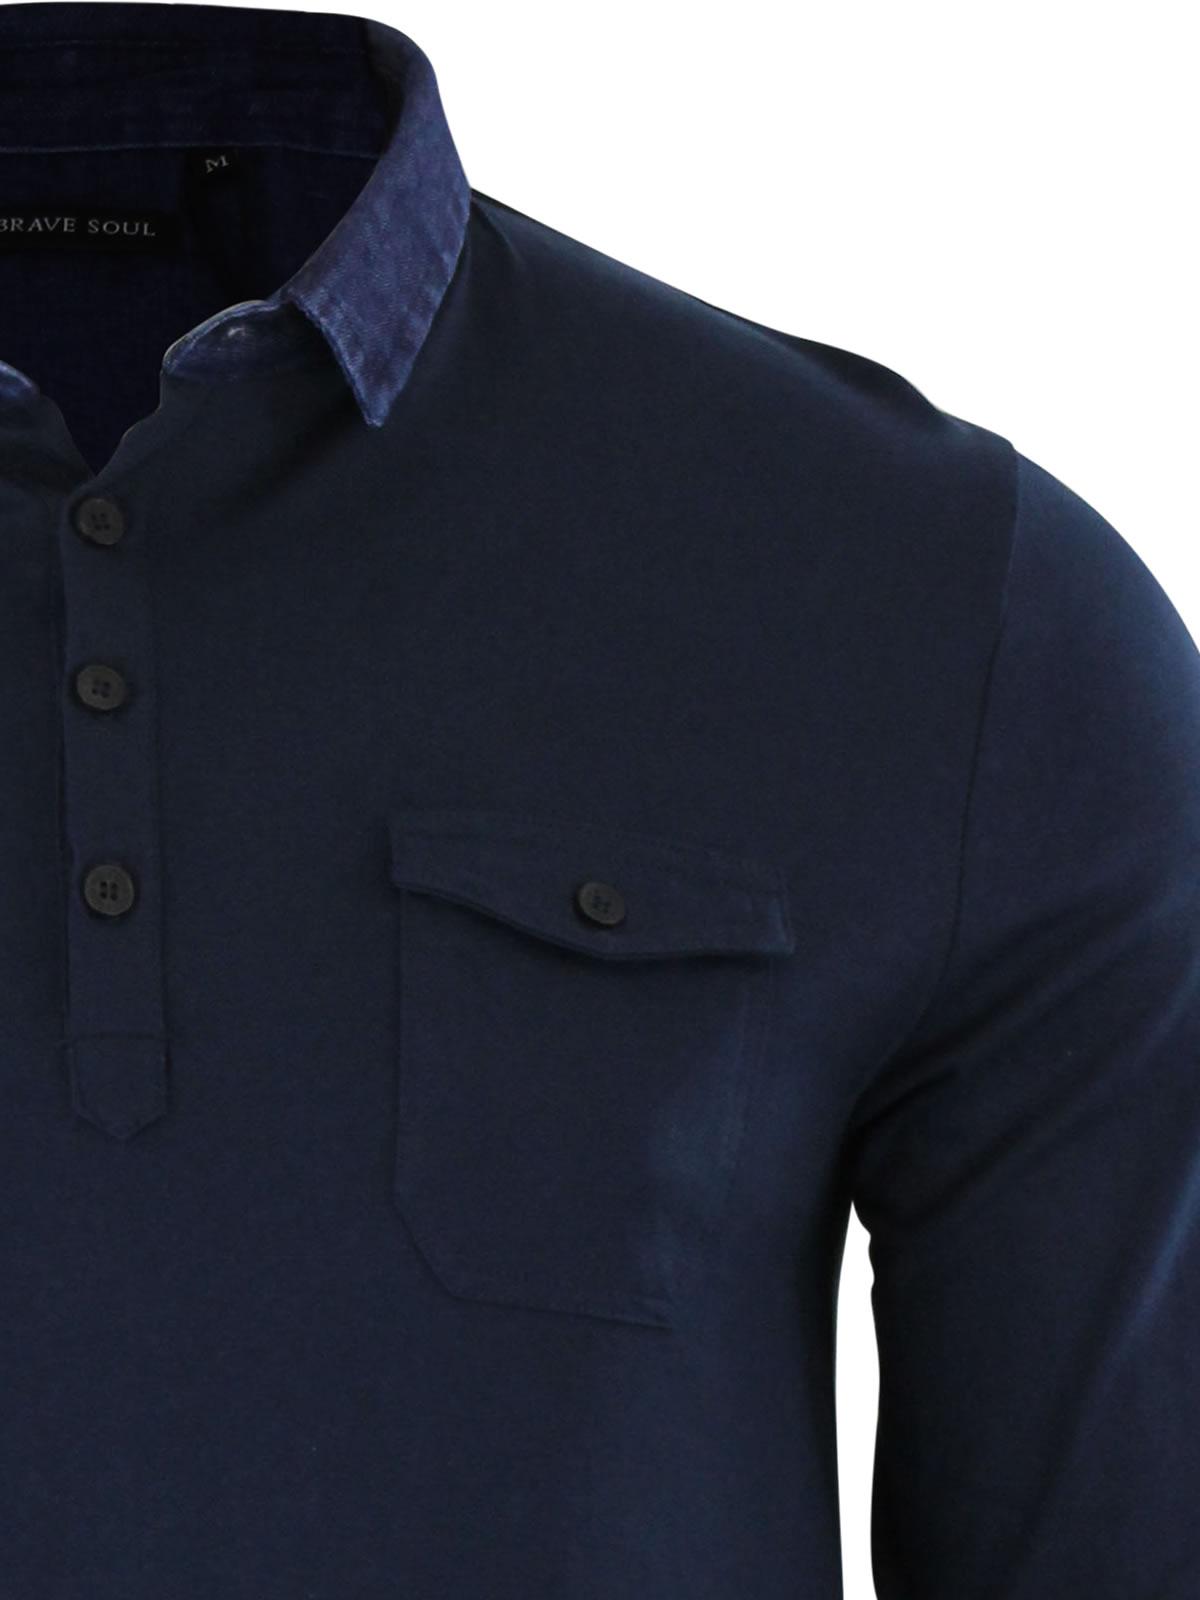 Mens-Polo-T-Shirt-Brave-Soul-Gospel-Denim-Collared-Long-Sleeve-Casual-Top thumbnail 7